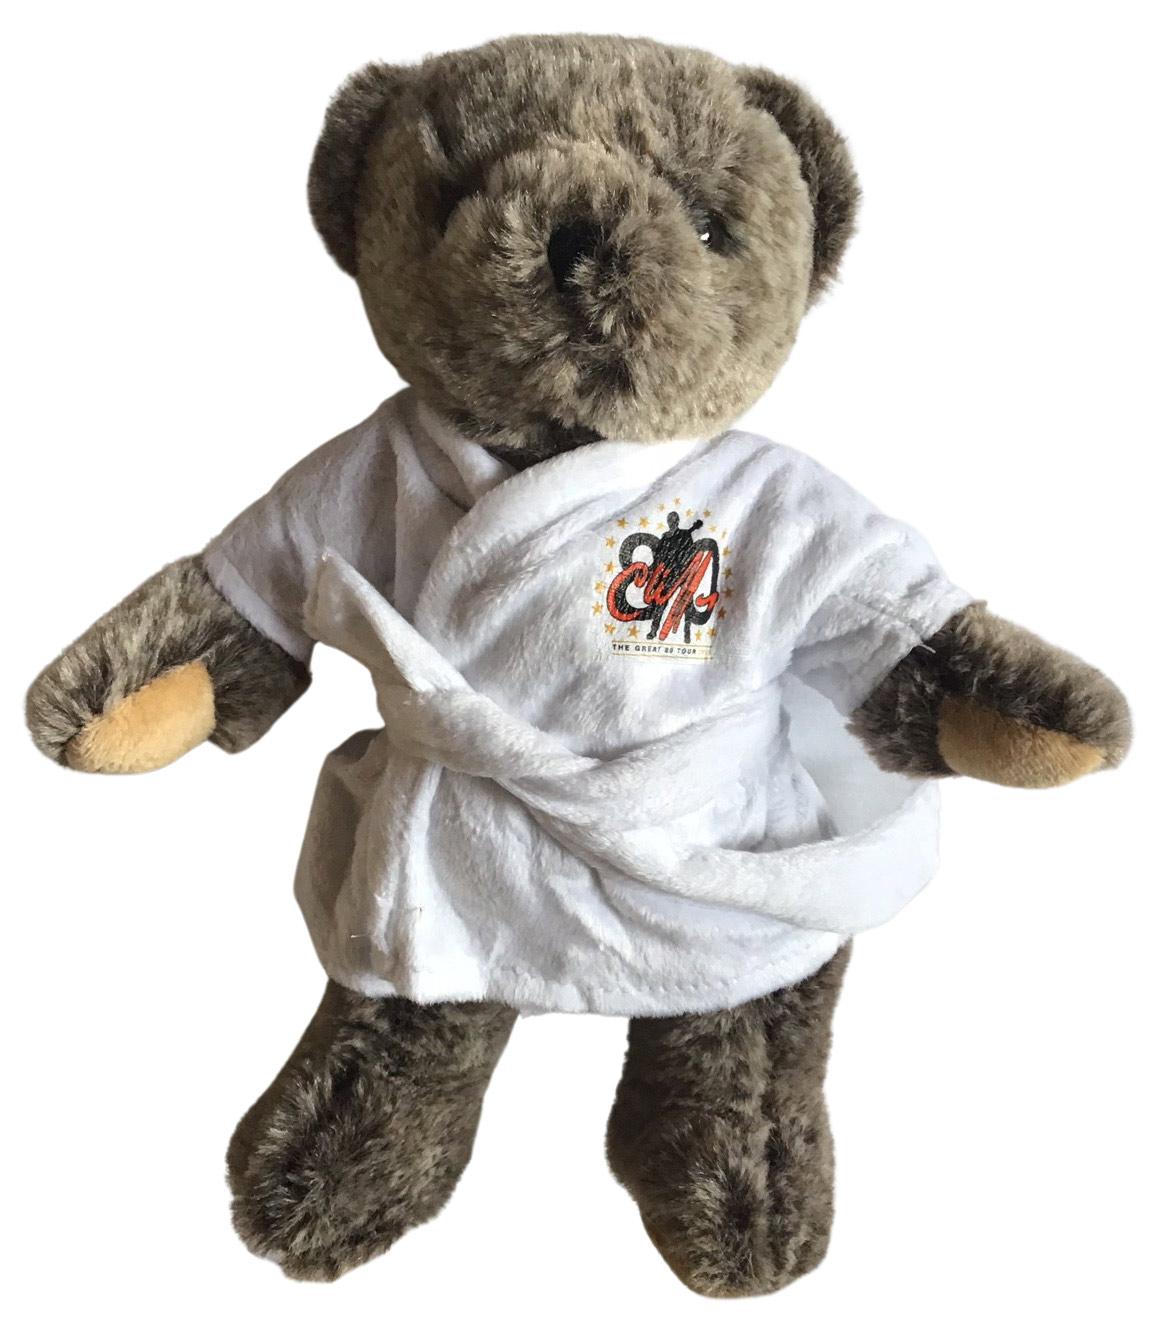 Sleepy Amie-Cliff Richard's2021 StarLogo Teddy Bear